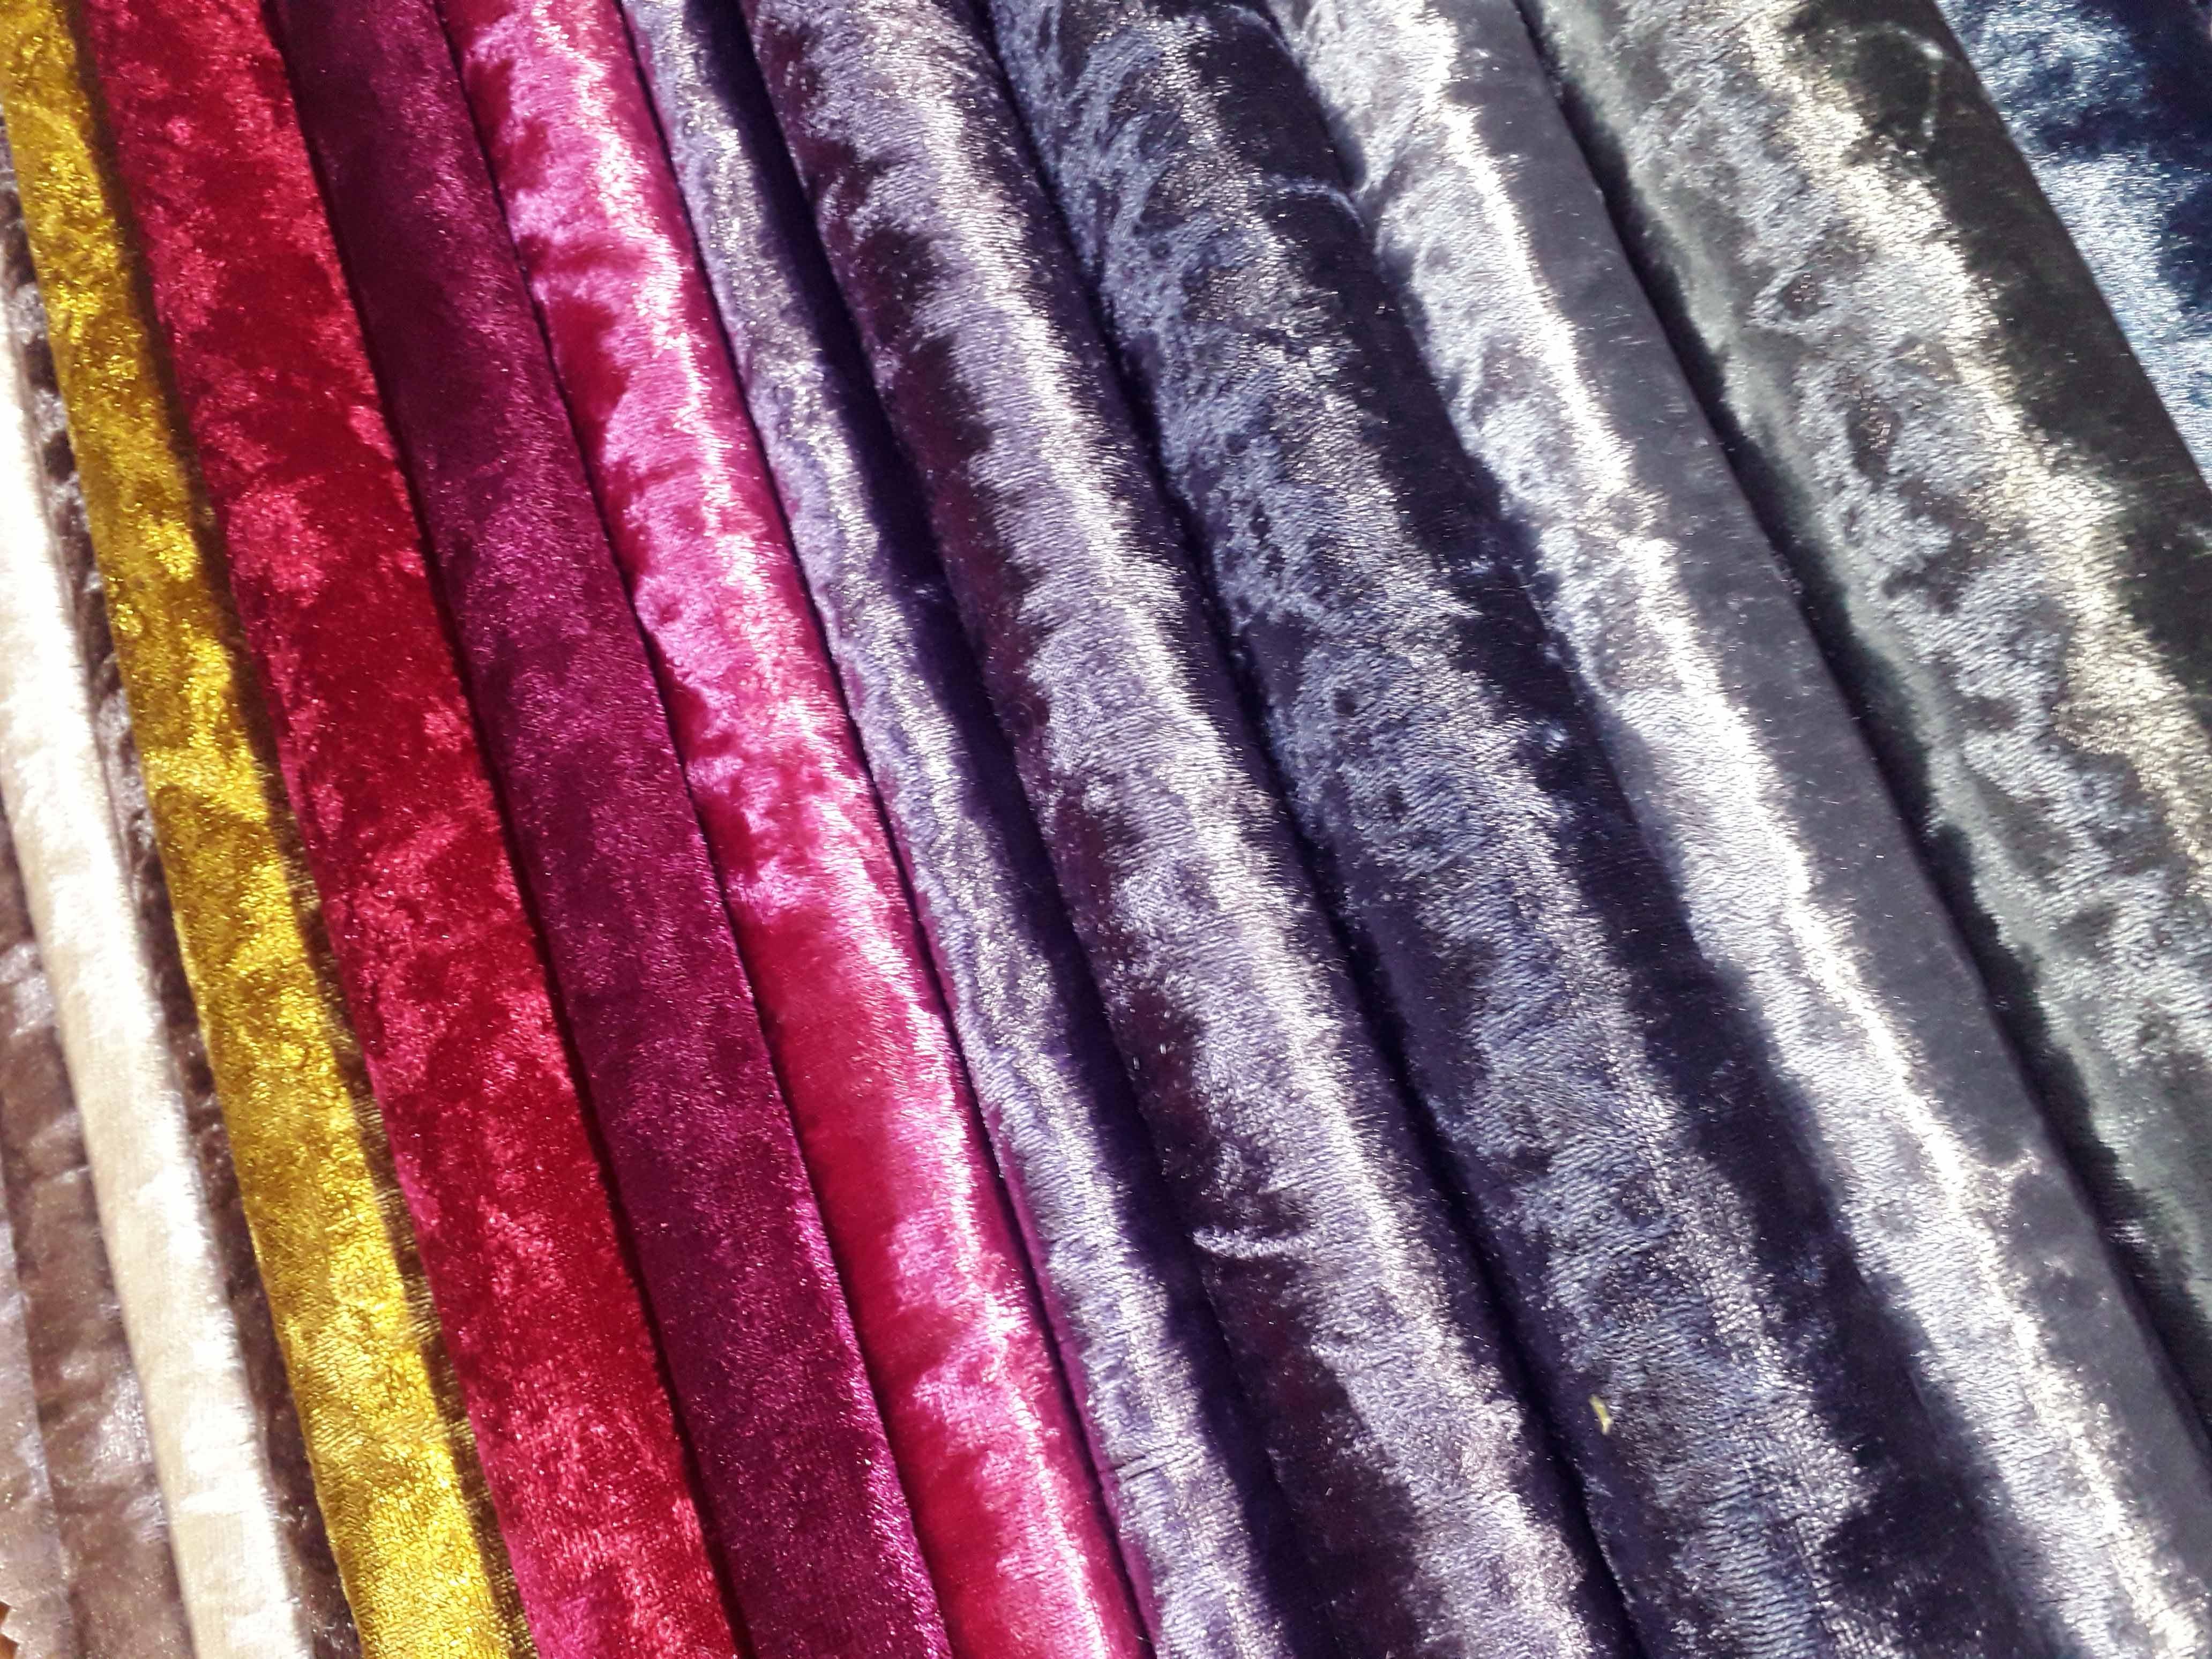 Luxury Bling Ivory Cream Heavy Crushed Velvet Curtain Fabric Upholstery Sofa